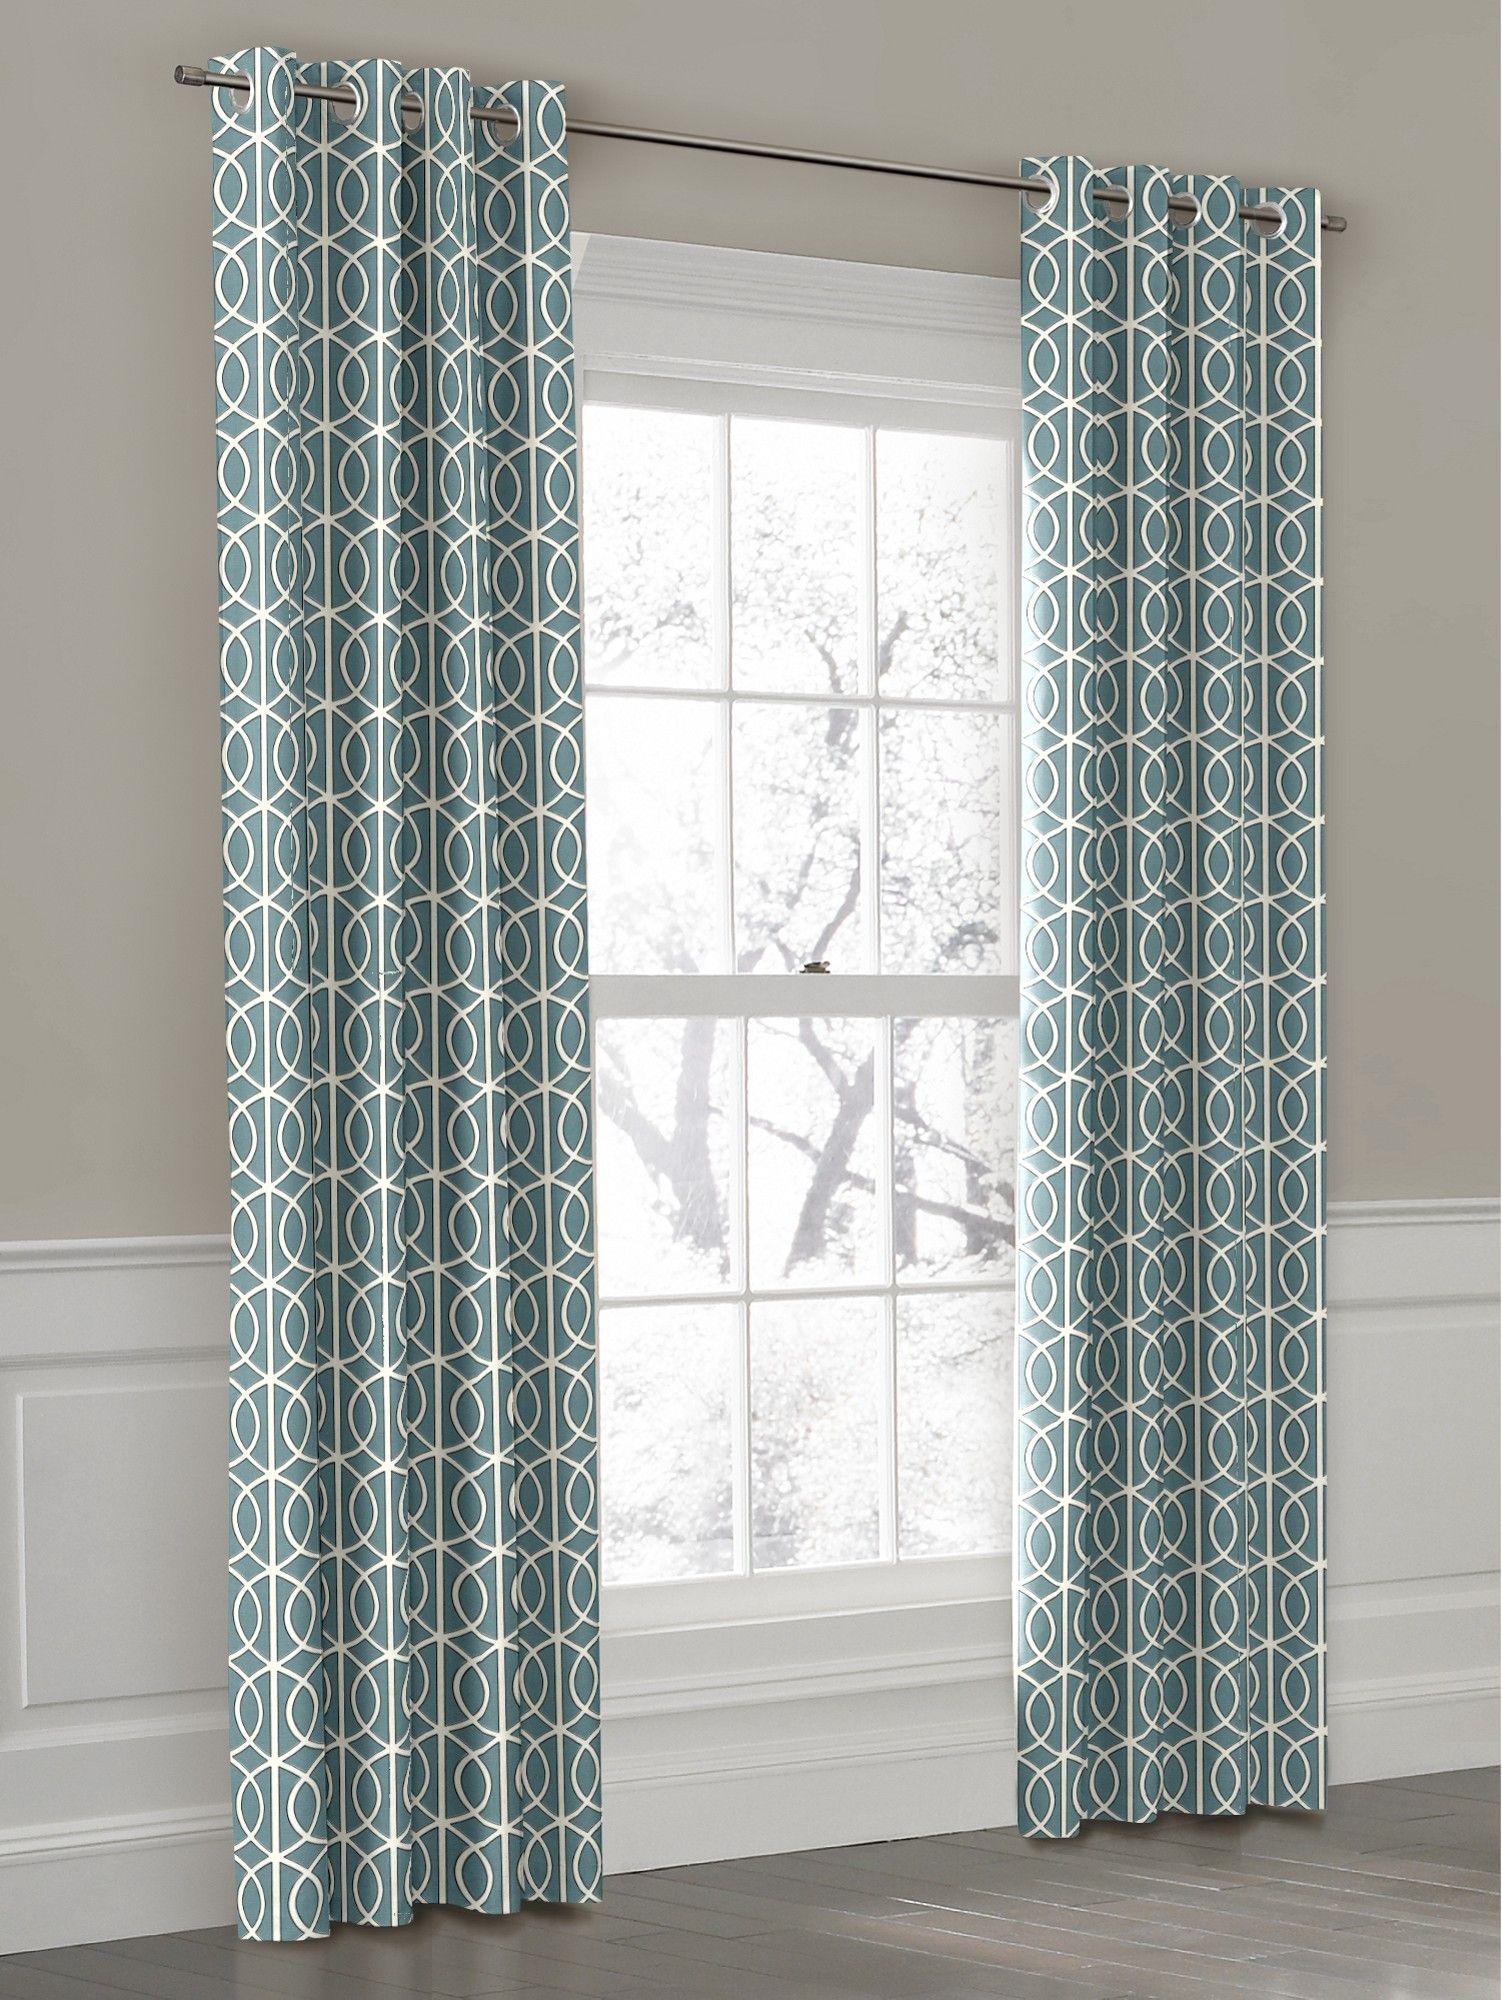 drapes refreshing curtains whitegreen polyester white geometric green p